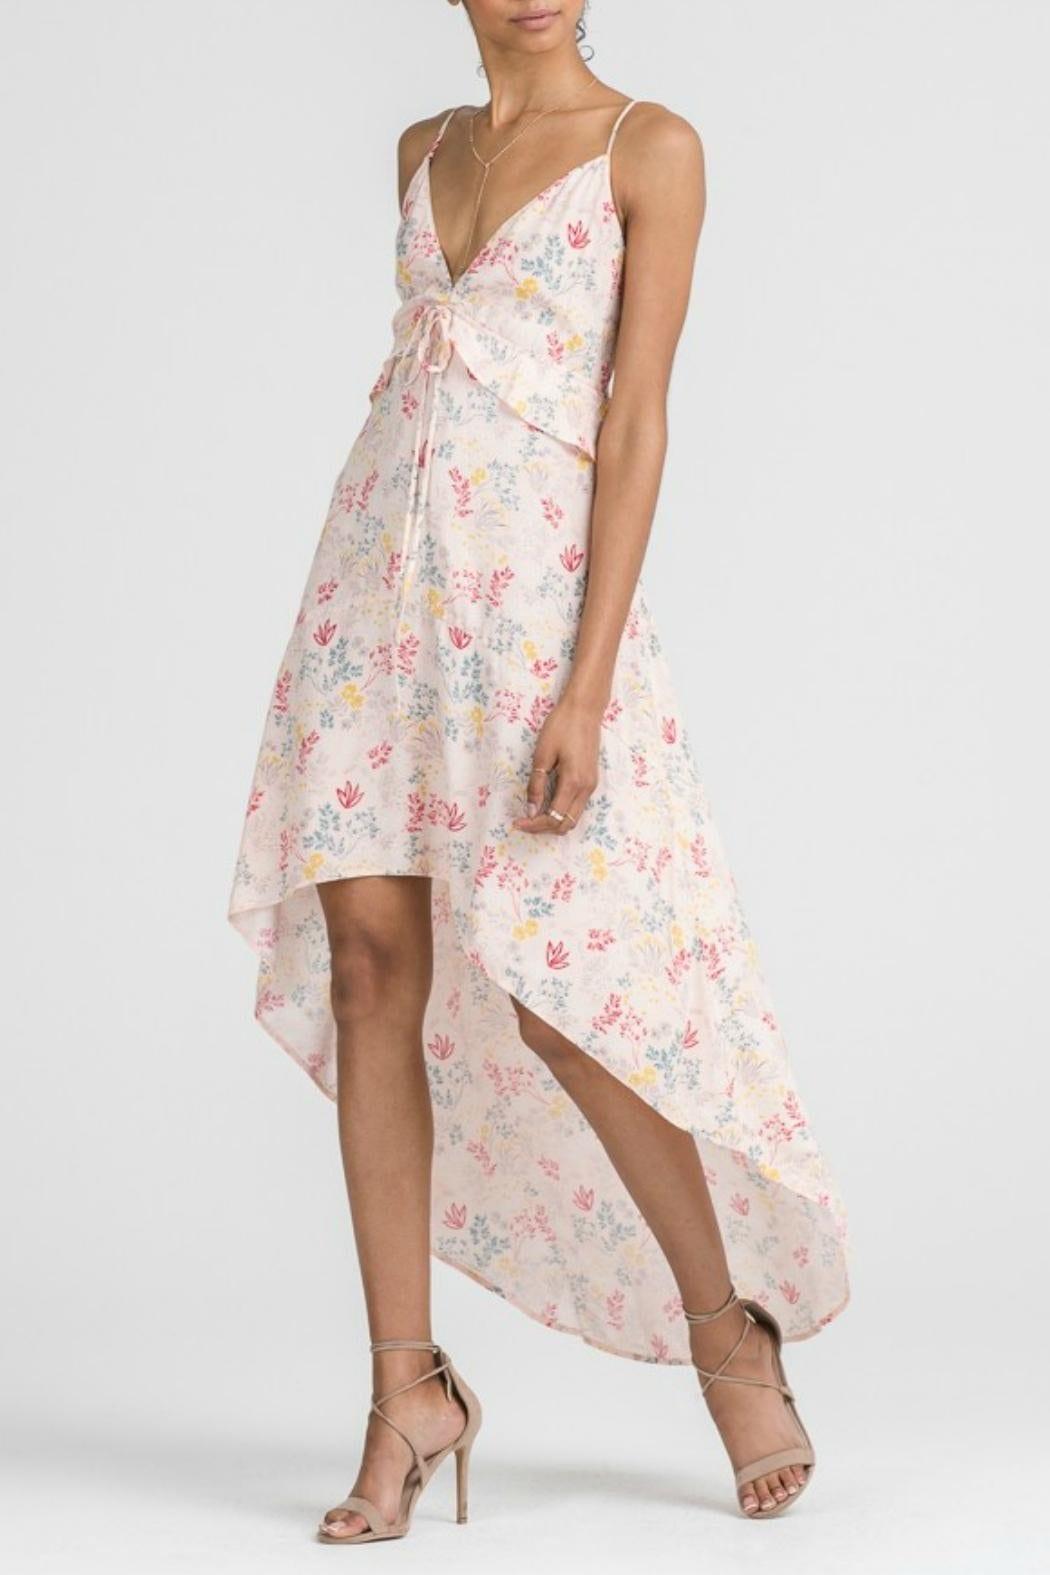 APRICOT LANE - FOLSOM Hi-low Max Multi / Floral Printed Dress